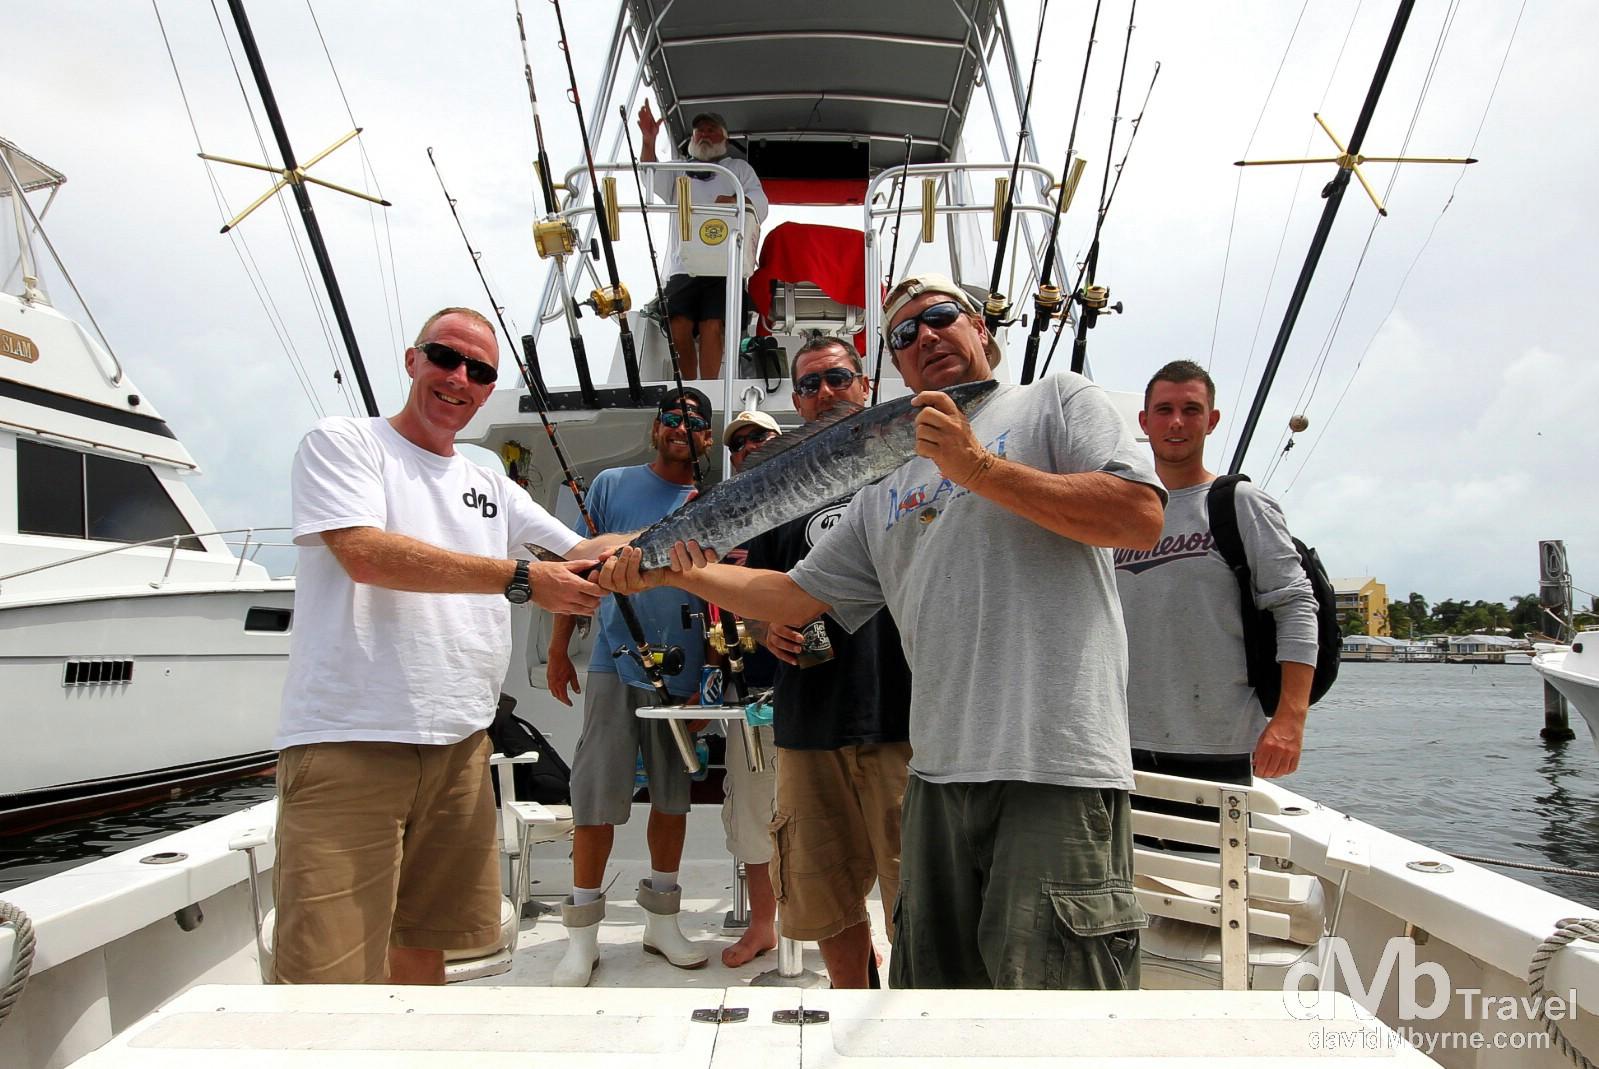 Key west florida usa dmb travel destination for Key west florida fishing